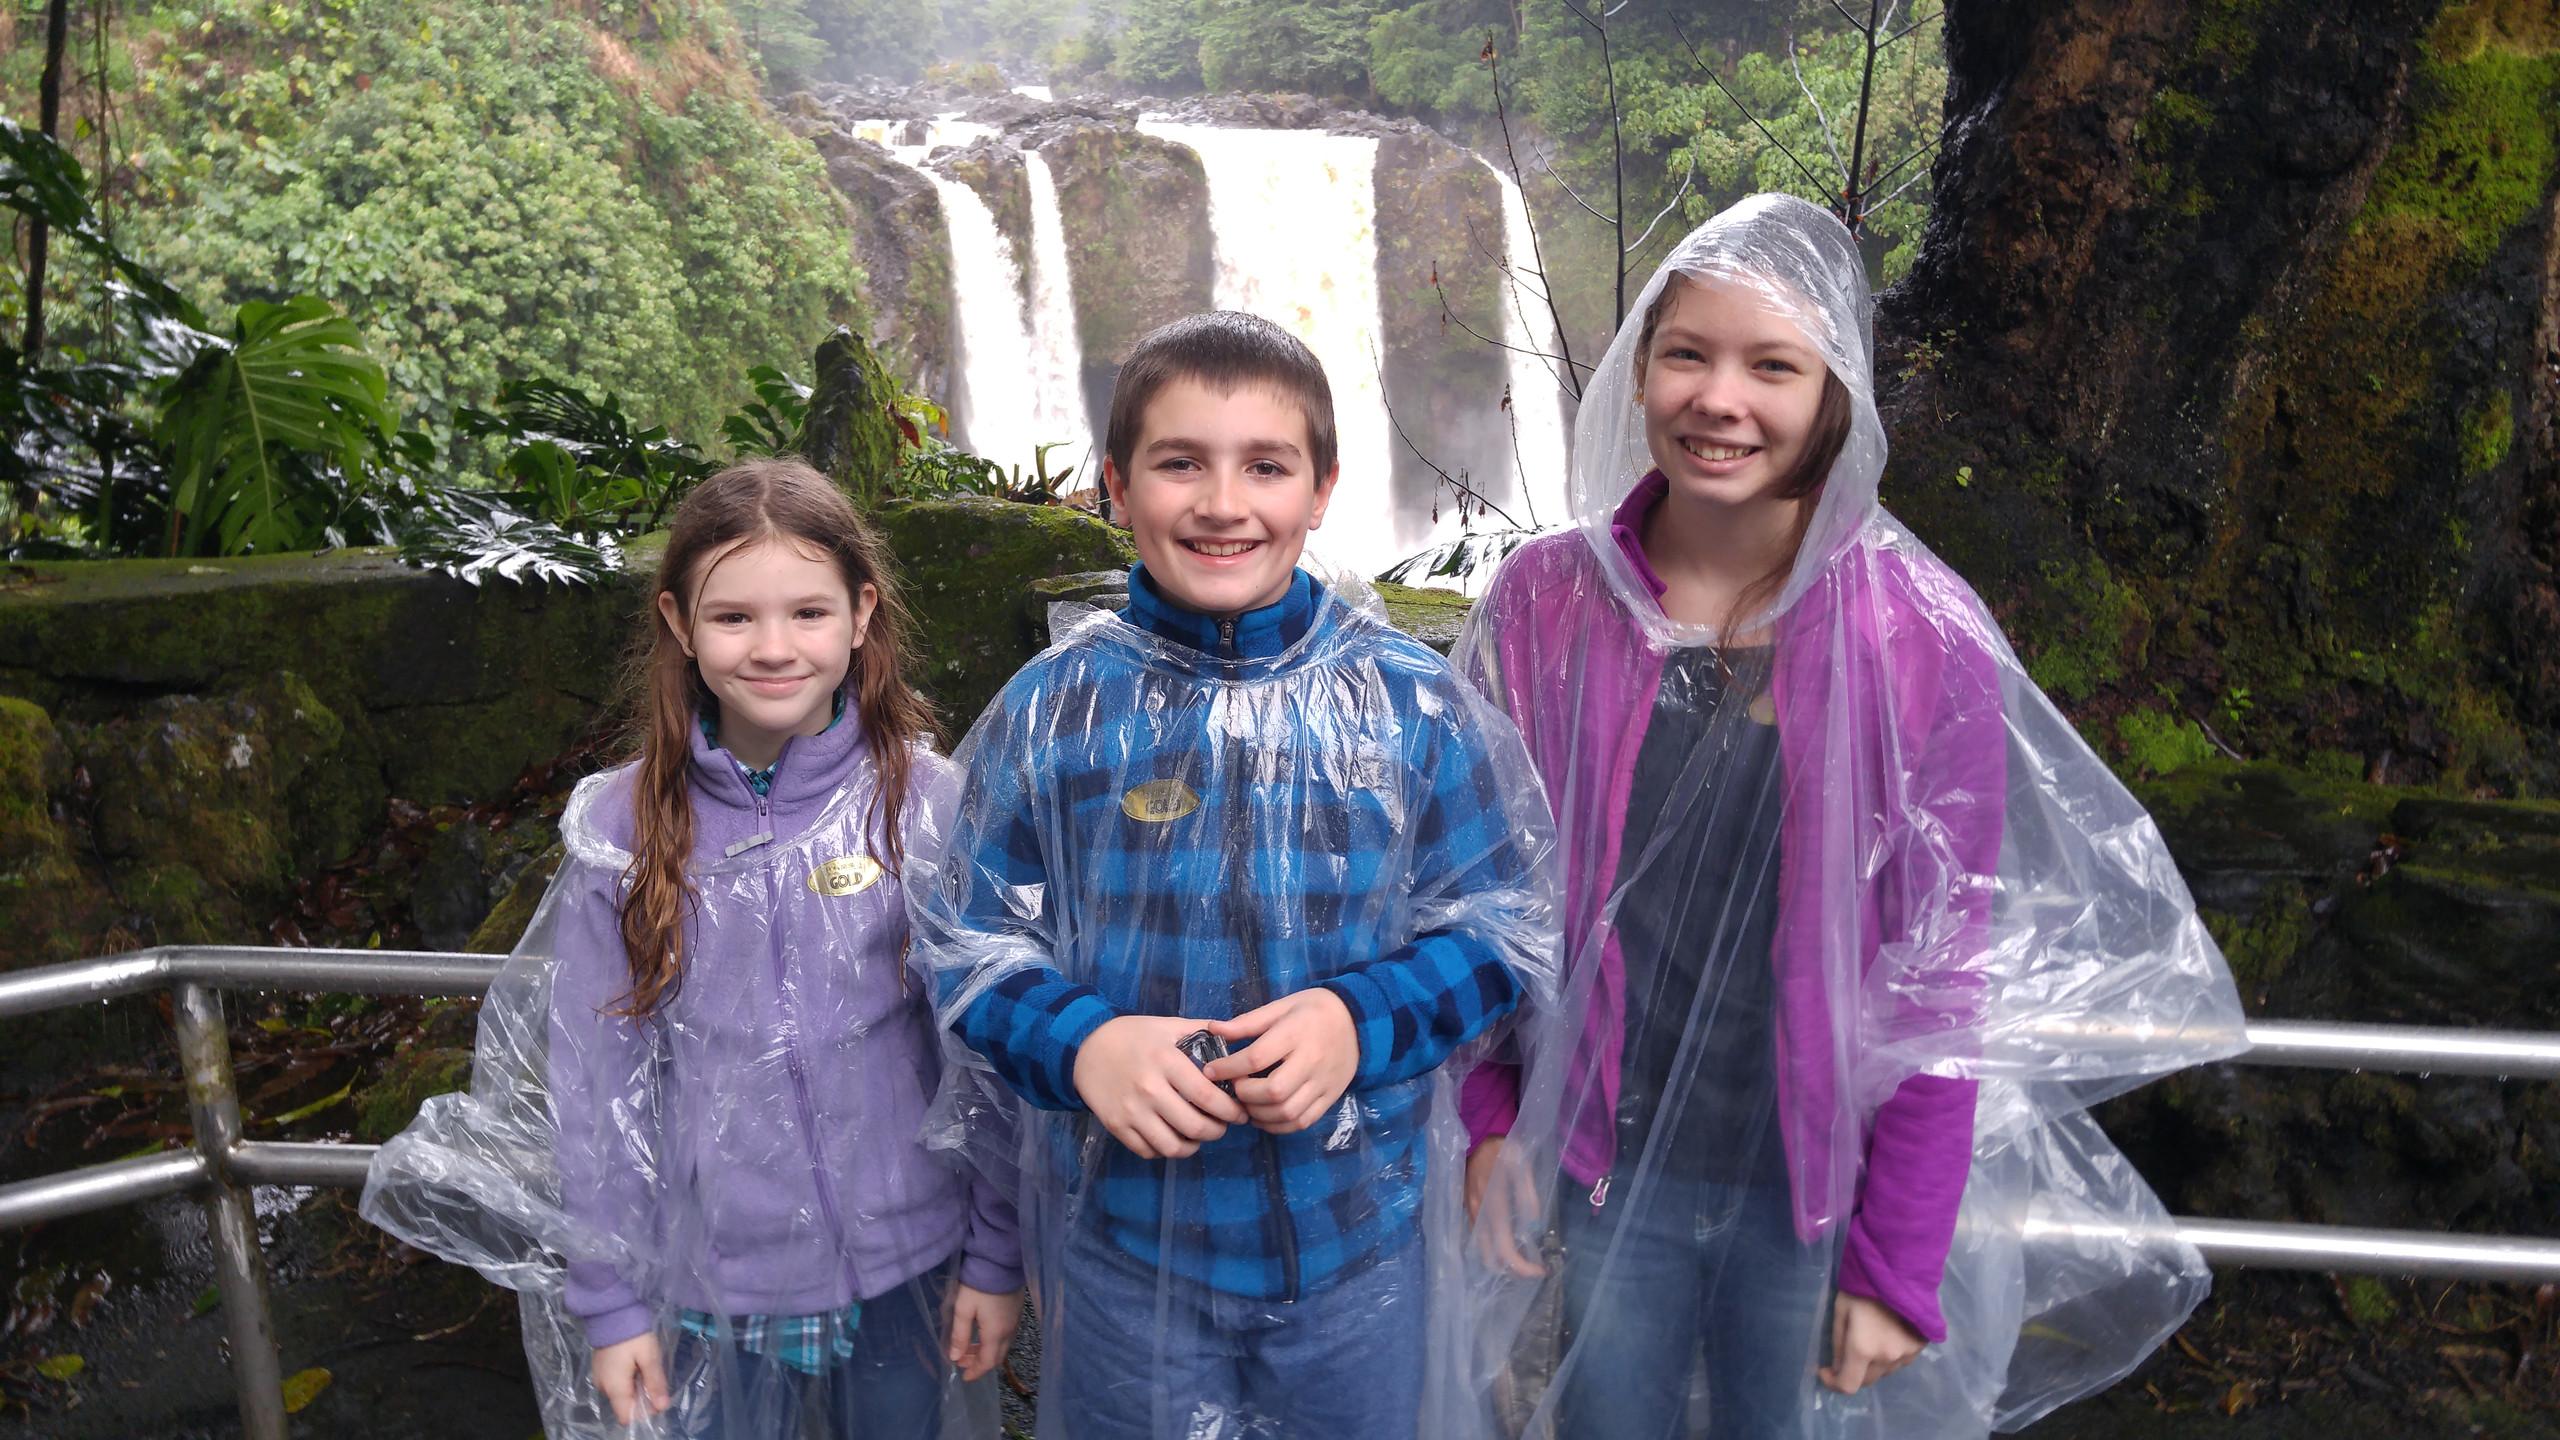 Siblings with hearing loss